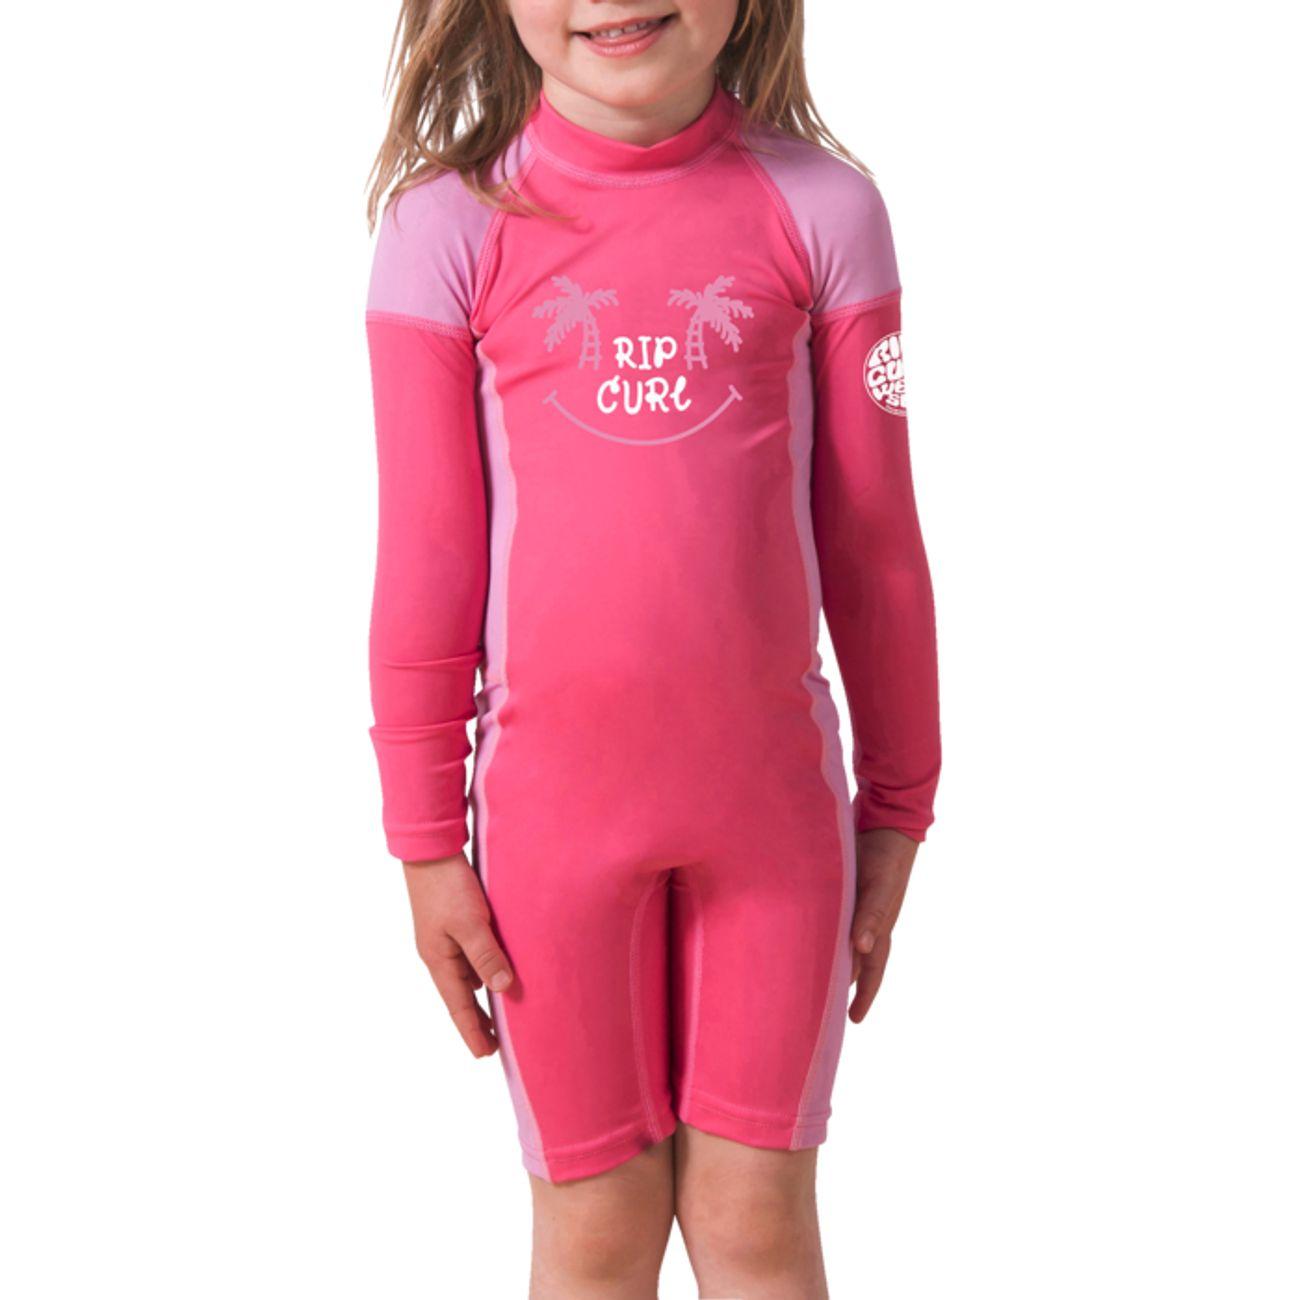 COMBINAISON Surf fille RIP CURL MINI LS UV SPRING